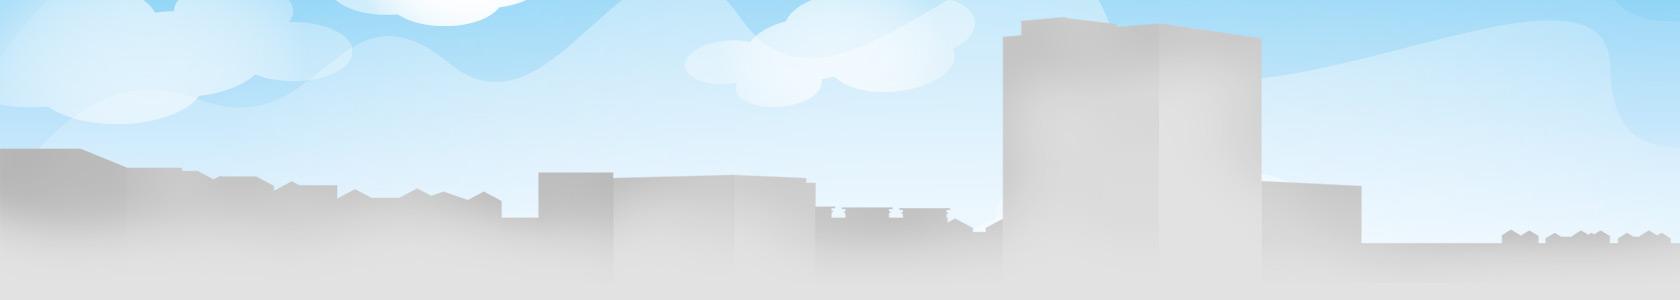 Holstebro-Struer Havn